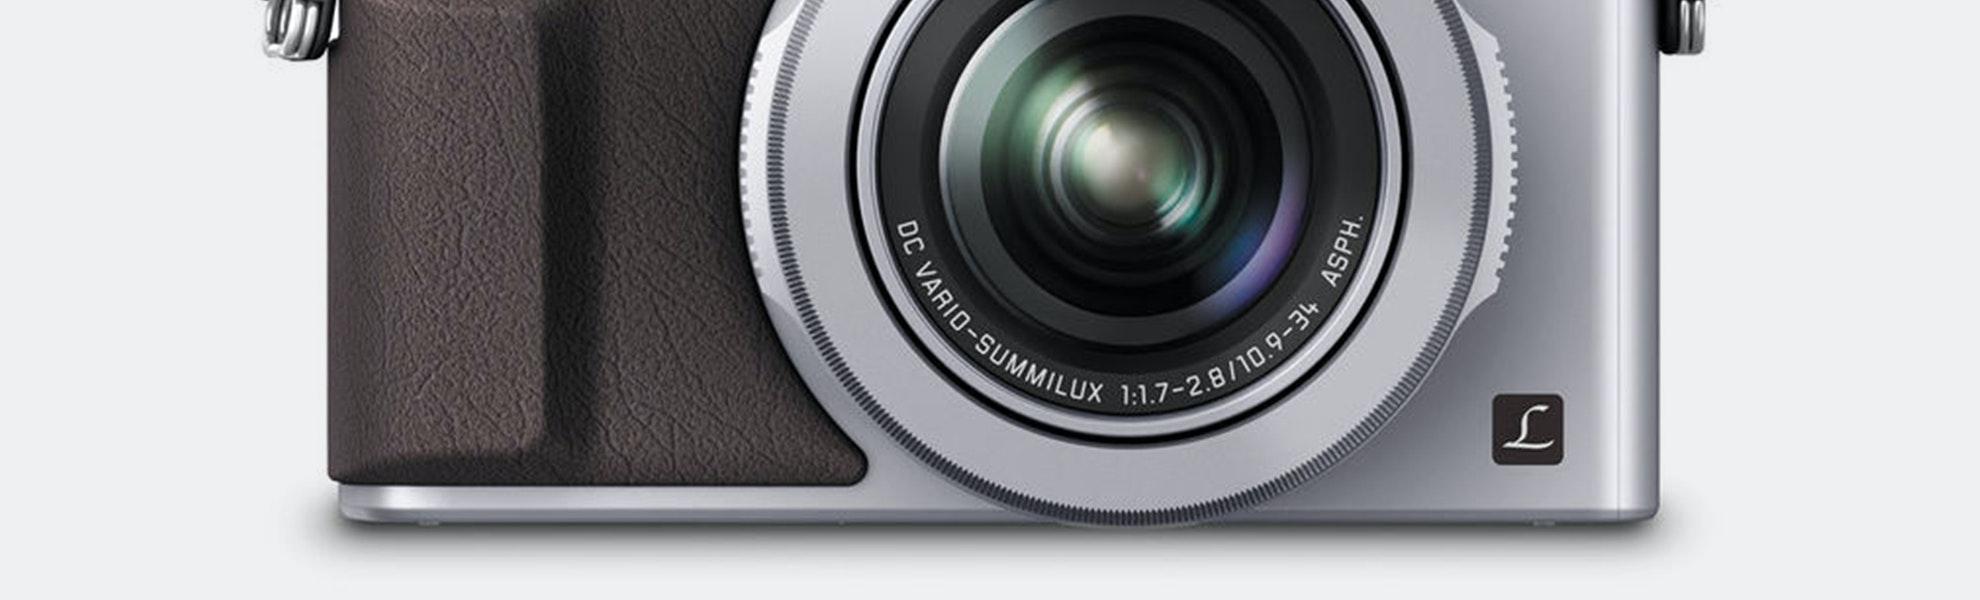 Panasonic Lumix DMC-LX100S 4K Camera